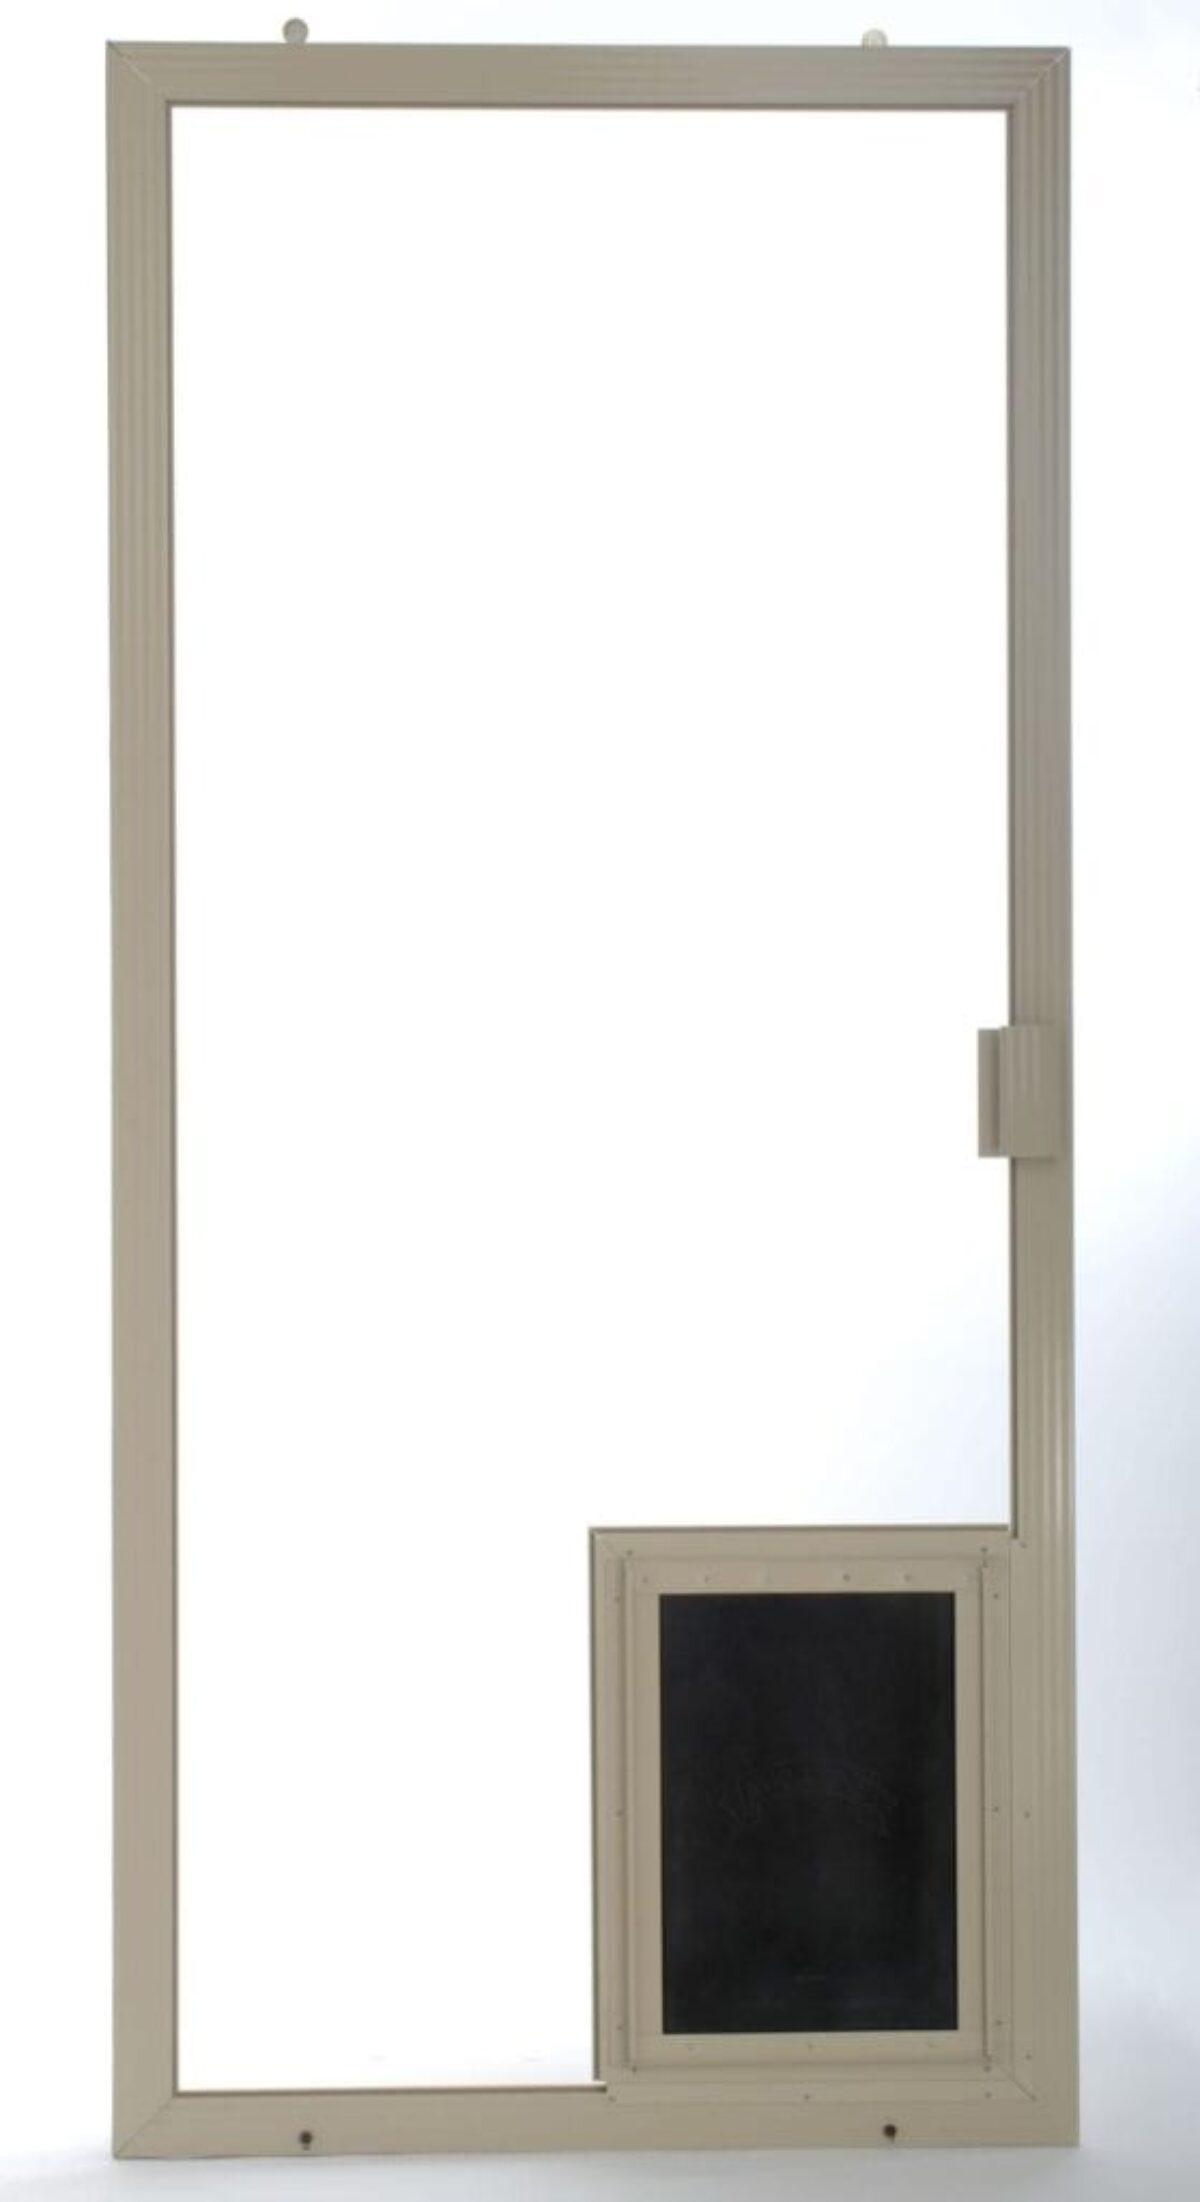 doggy door mounted on a heavy duty sliding screen door